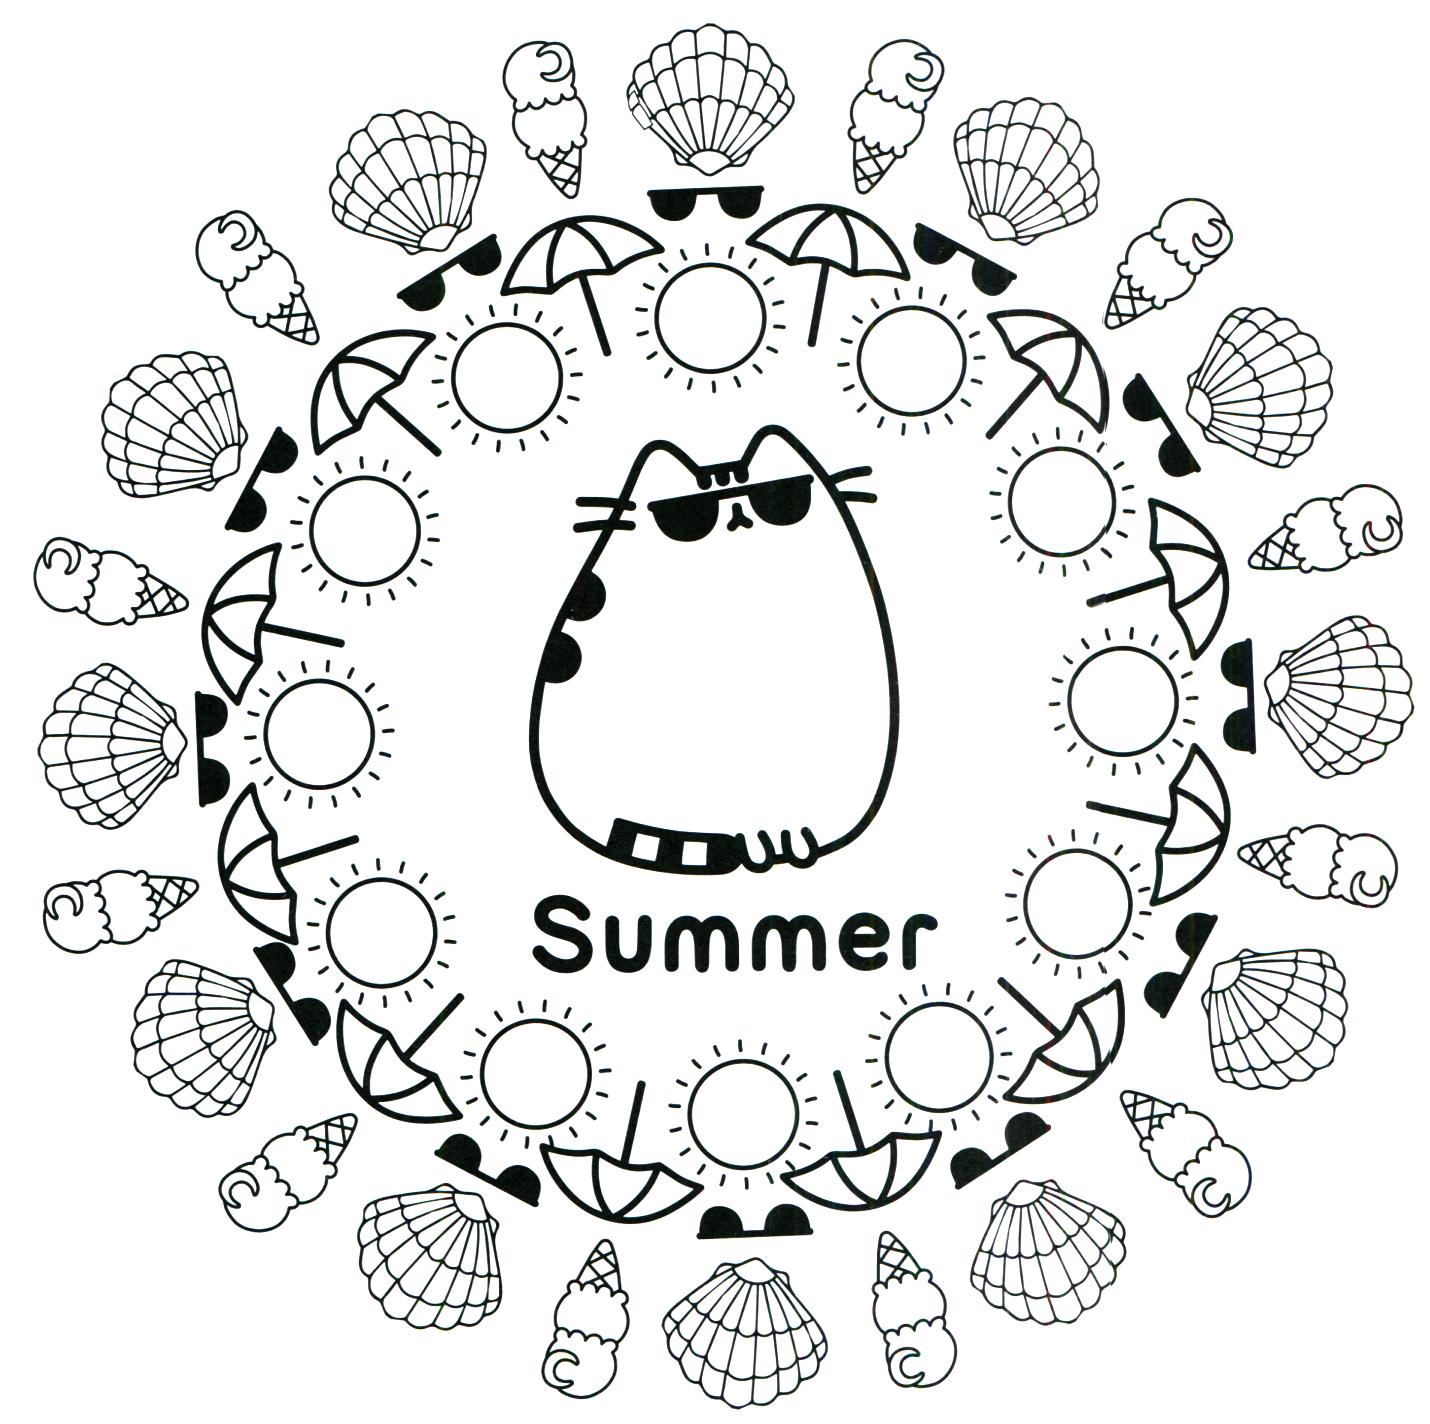 Pusheen Coloring Book Pusheen Pusheen The Cat Pusheen Coloring Pages Summer Coloring Pages Coloring Pages For Teenagers